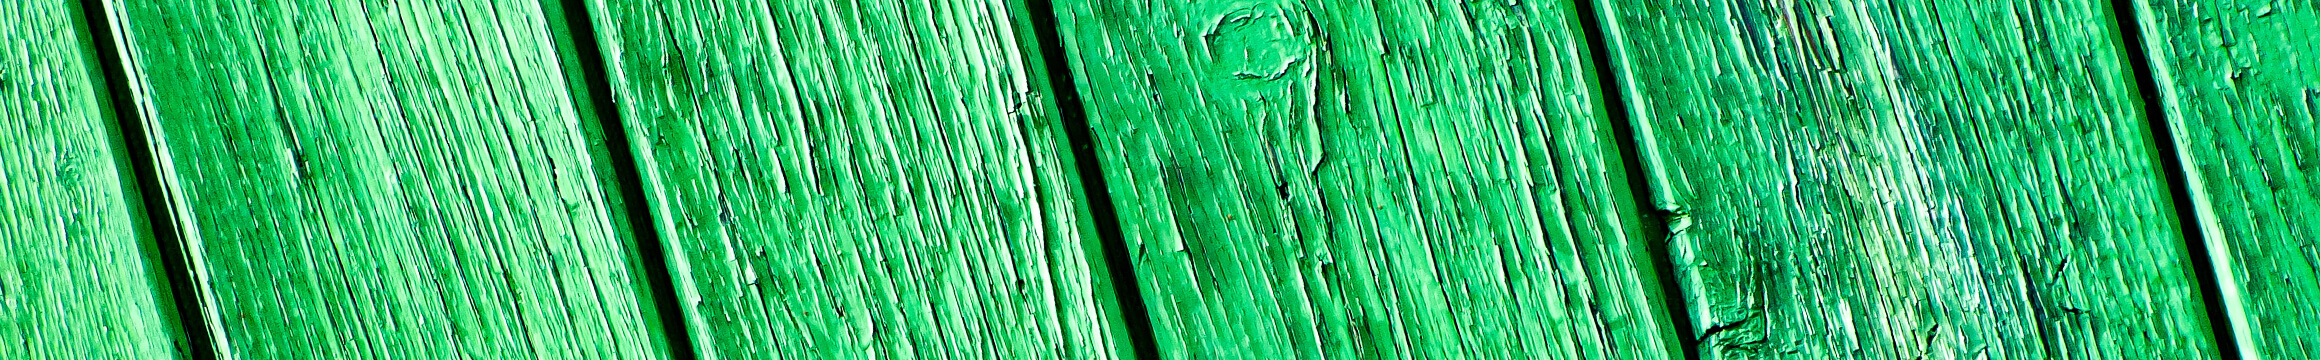 Wood Painted 02